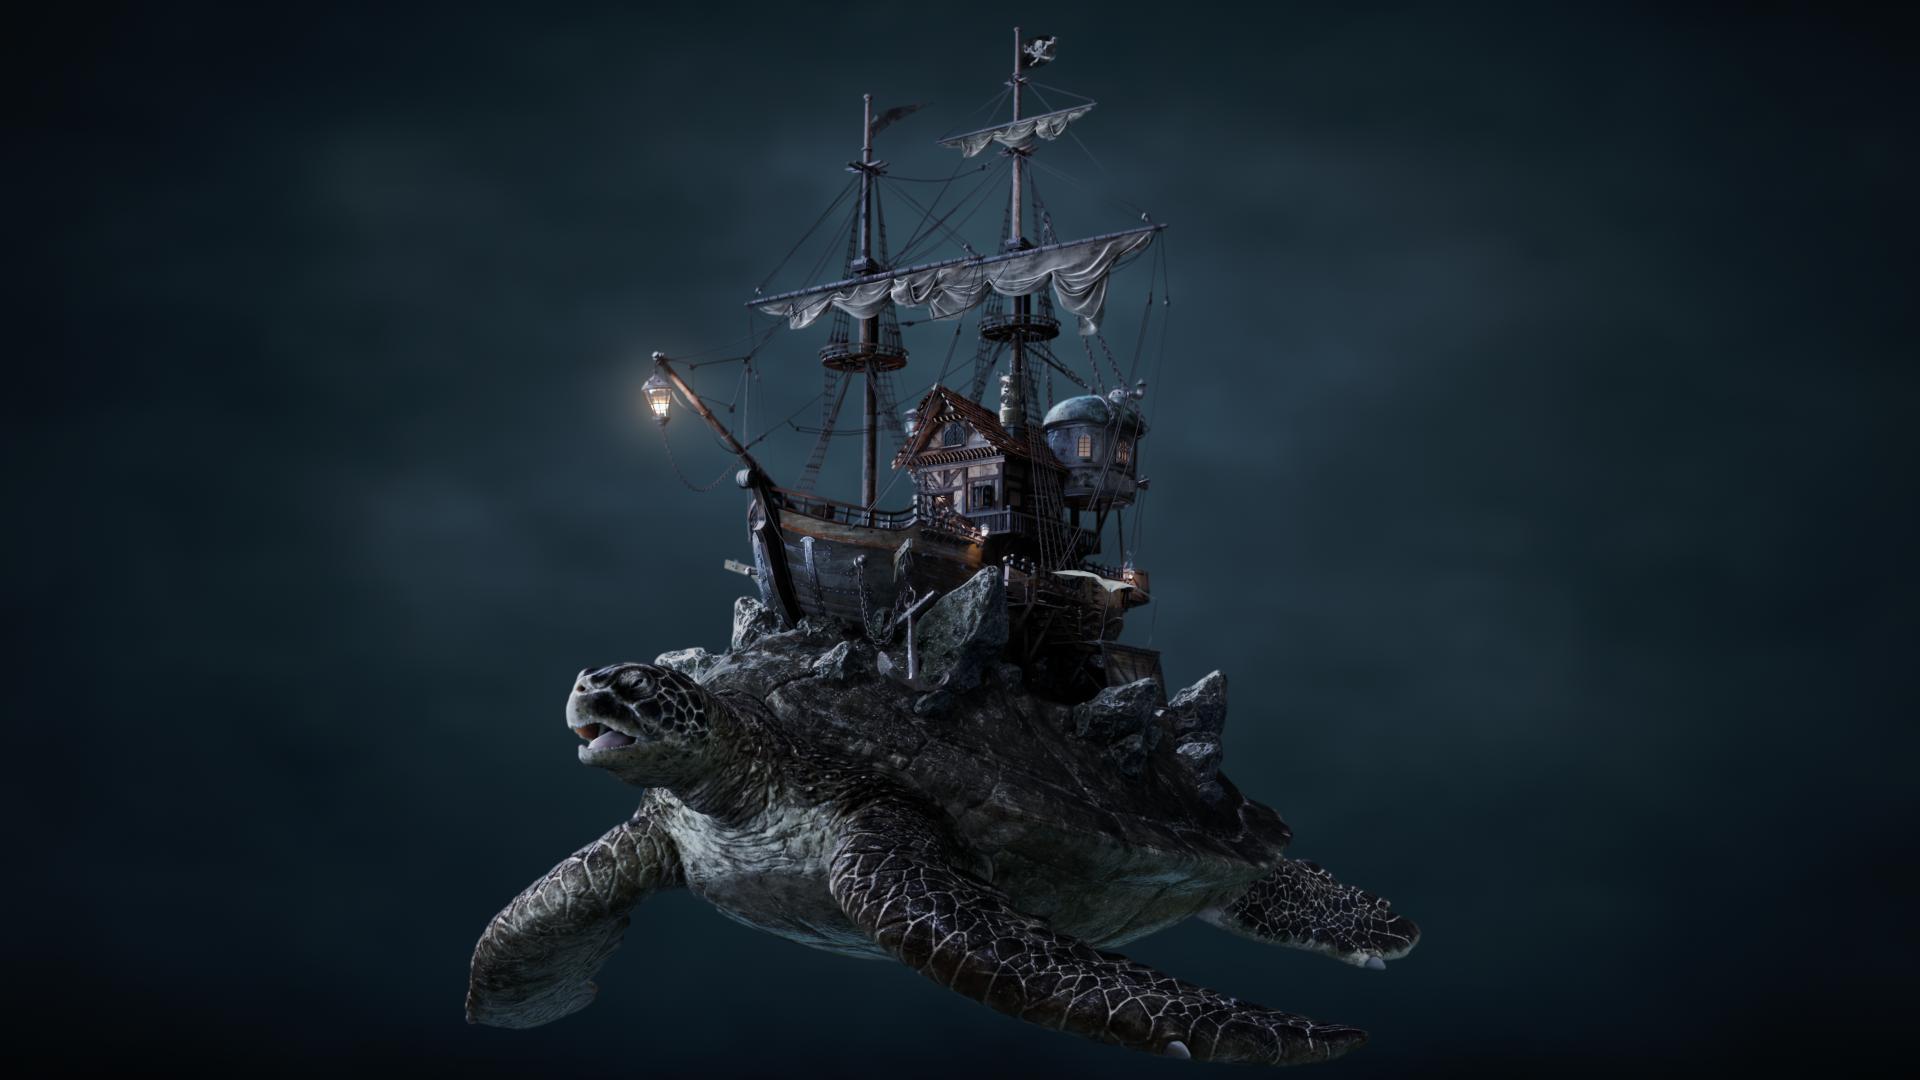 Turtle Ship / 2018.03